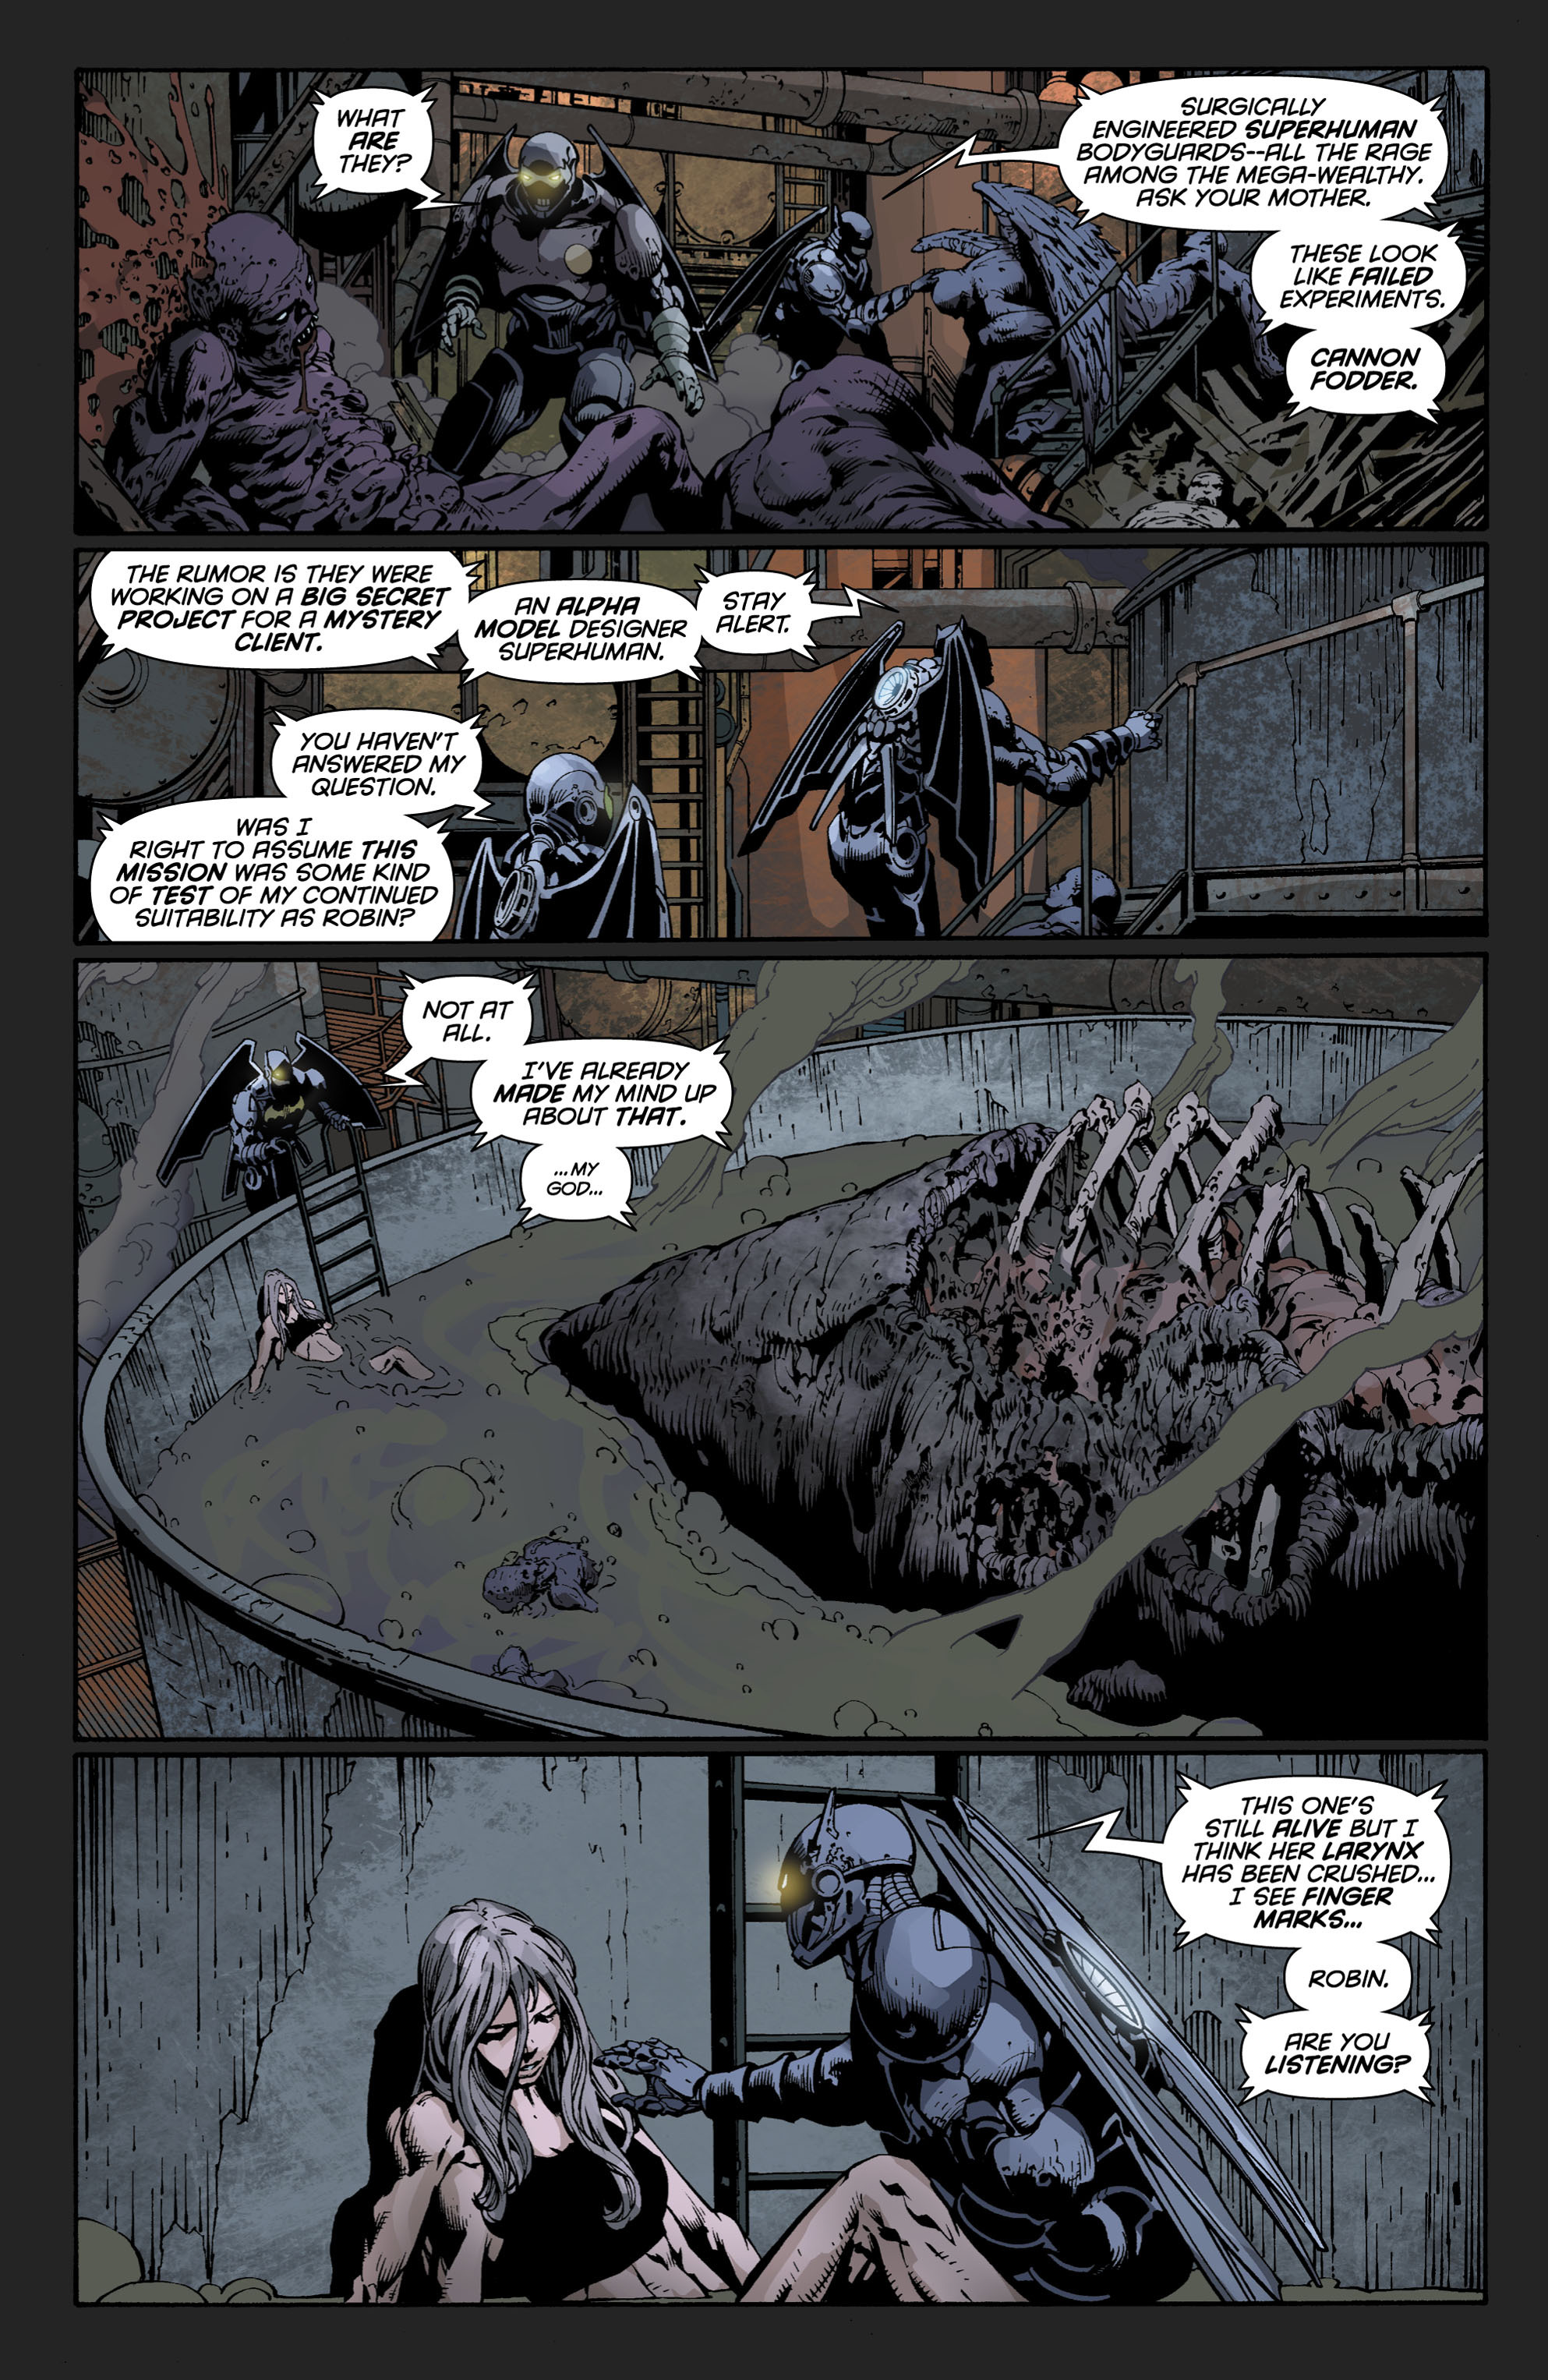 Read online Batman: The Return comic -  Issue # Full - 18